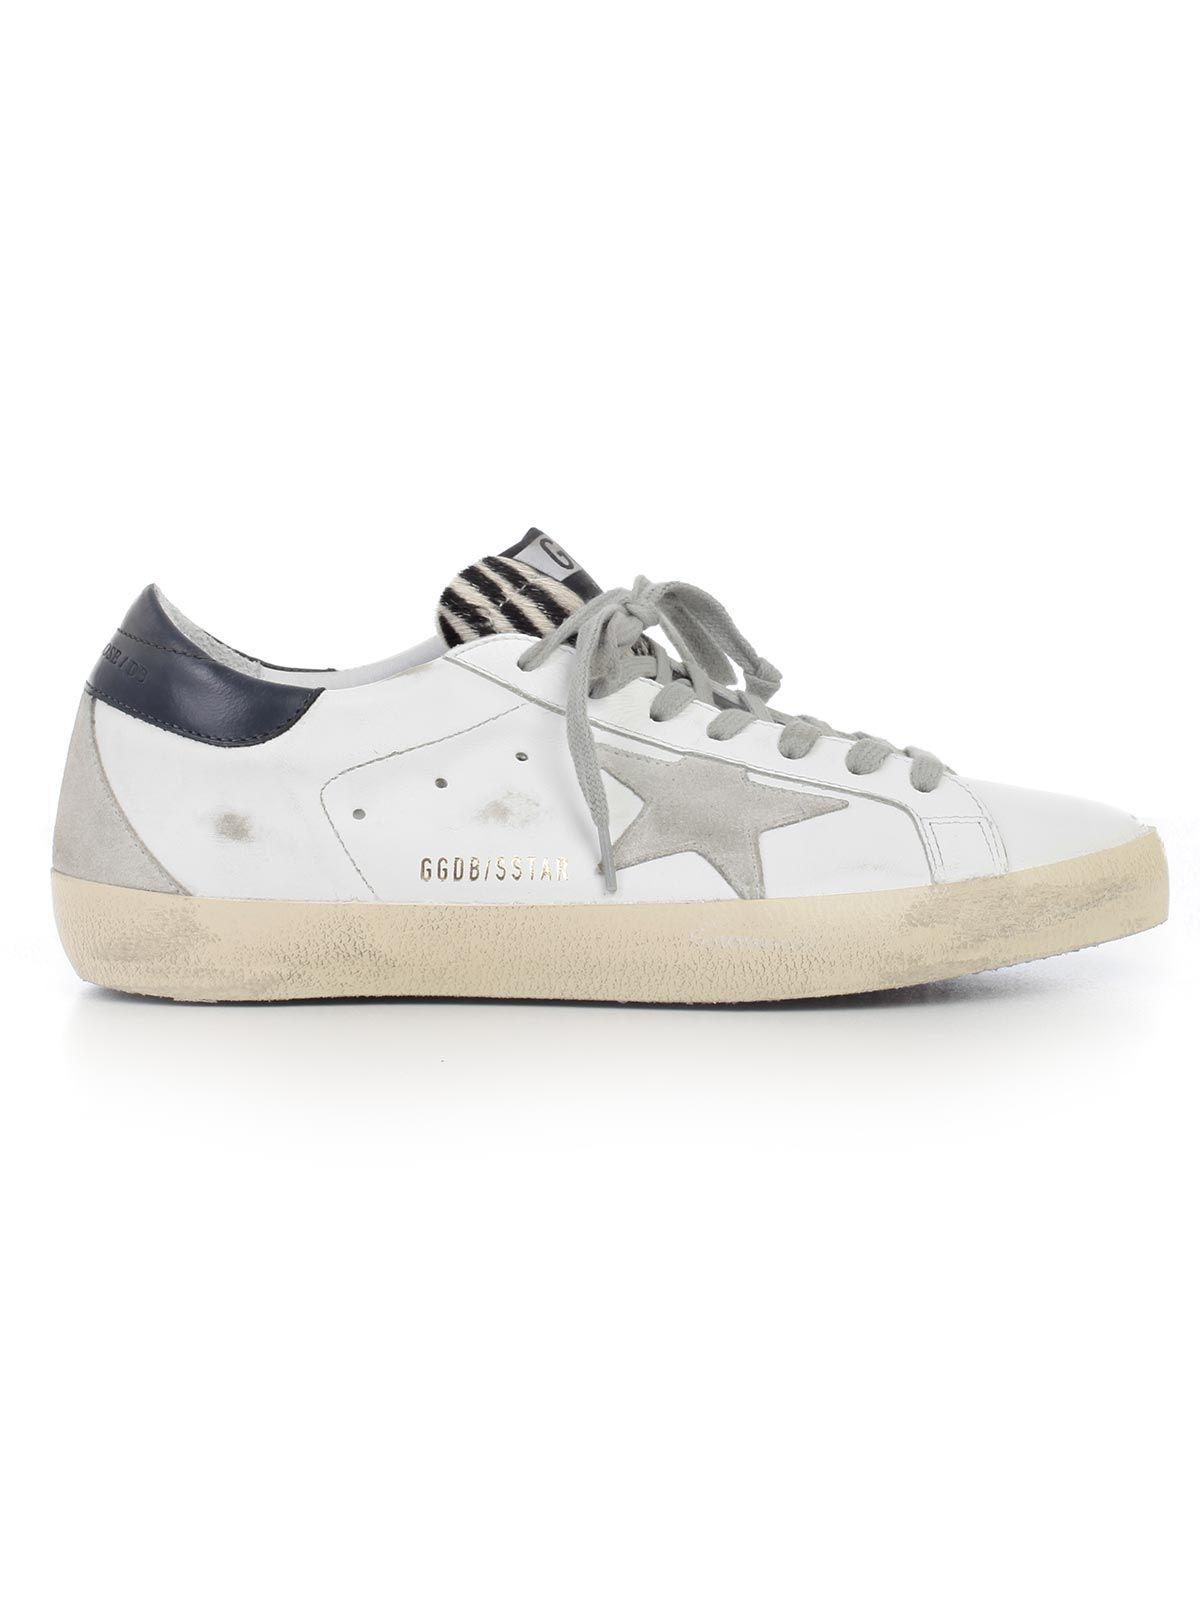 golden goose golden goose sneakers bwhite blue zebra cream sole men 39 s sneakers italist. Black Bedroom Furniture Sets. Home Design Ideas